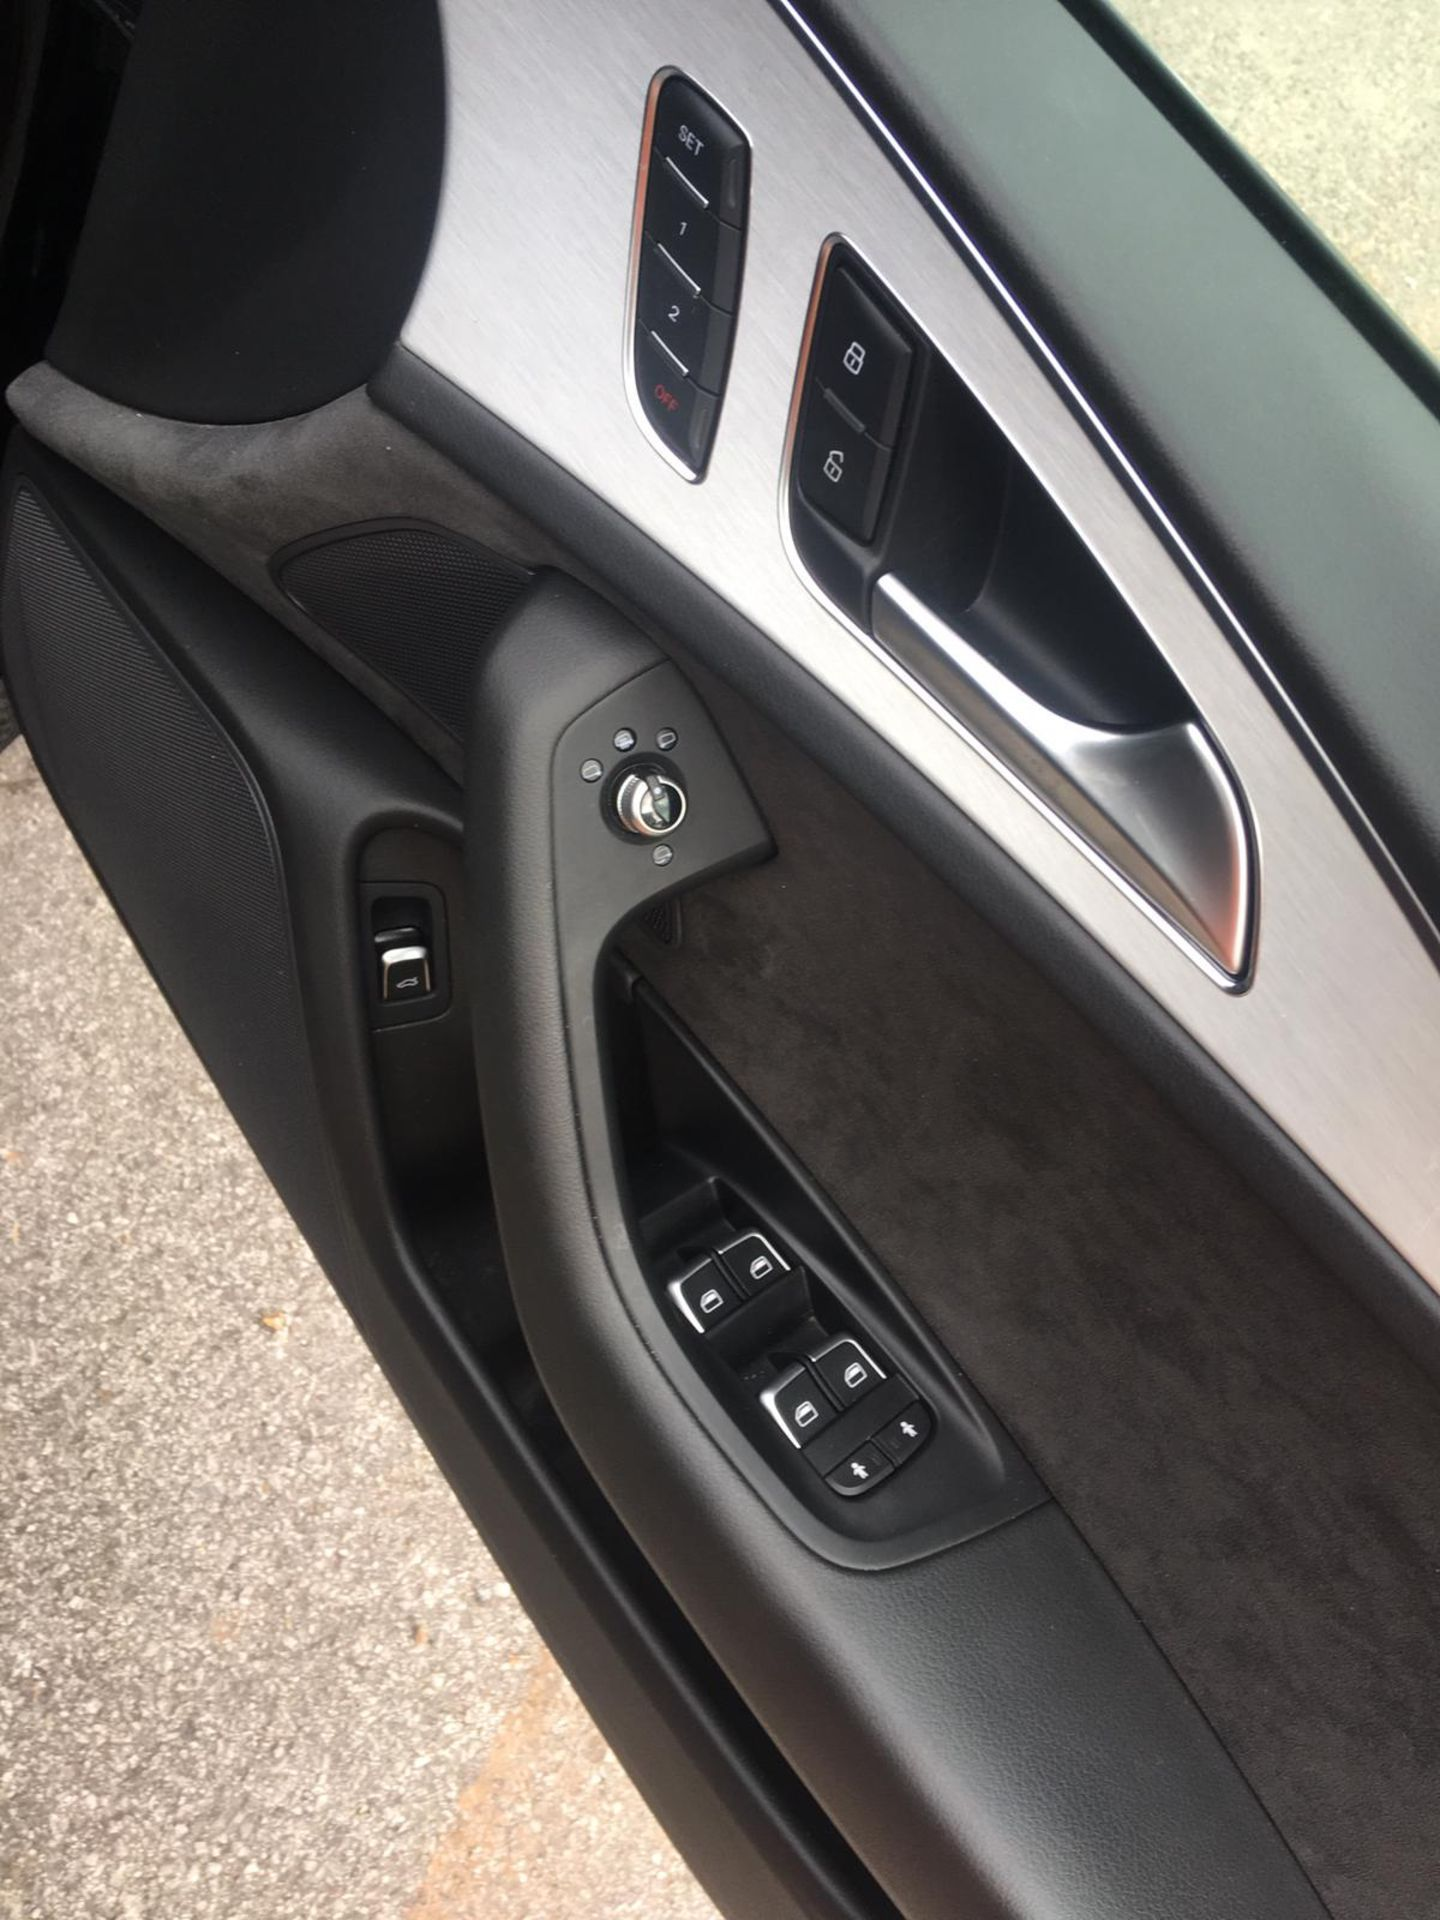 2018/18 REG AUDI A6 S LINE TDI ULTRA SEMI-AUTO 2.0 DIESEL ESTATE, SHOWING 1 FORMER KEEPER *NO VAT* - Image 22 of 33